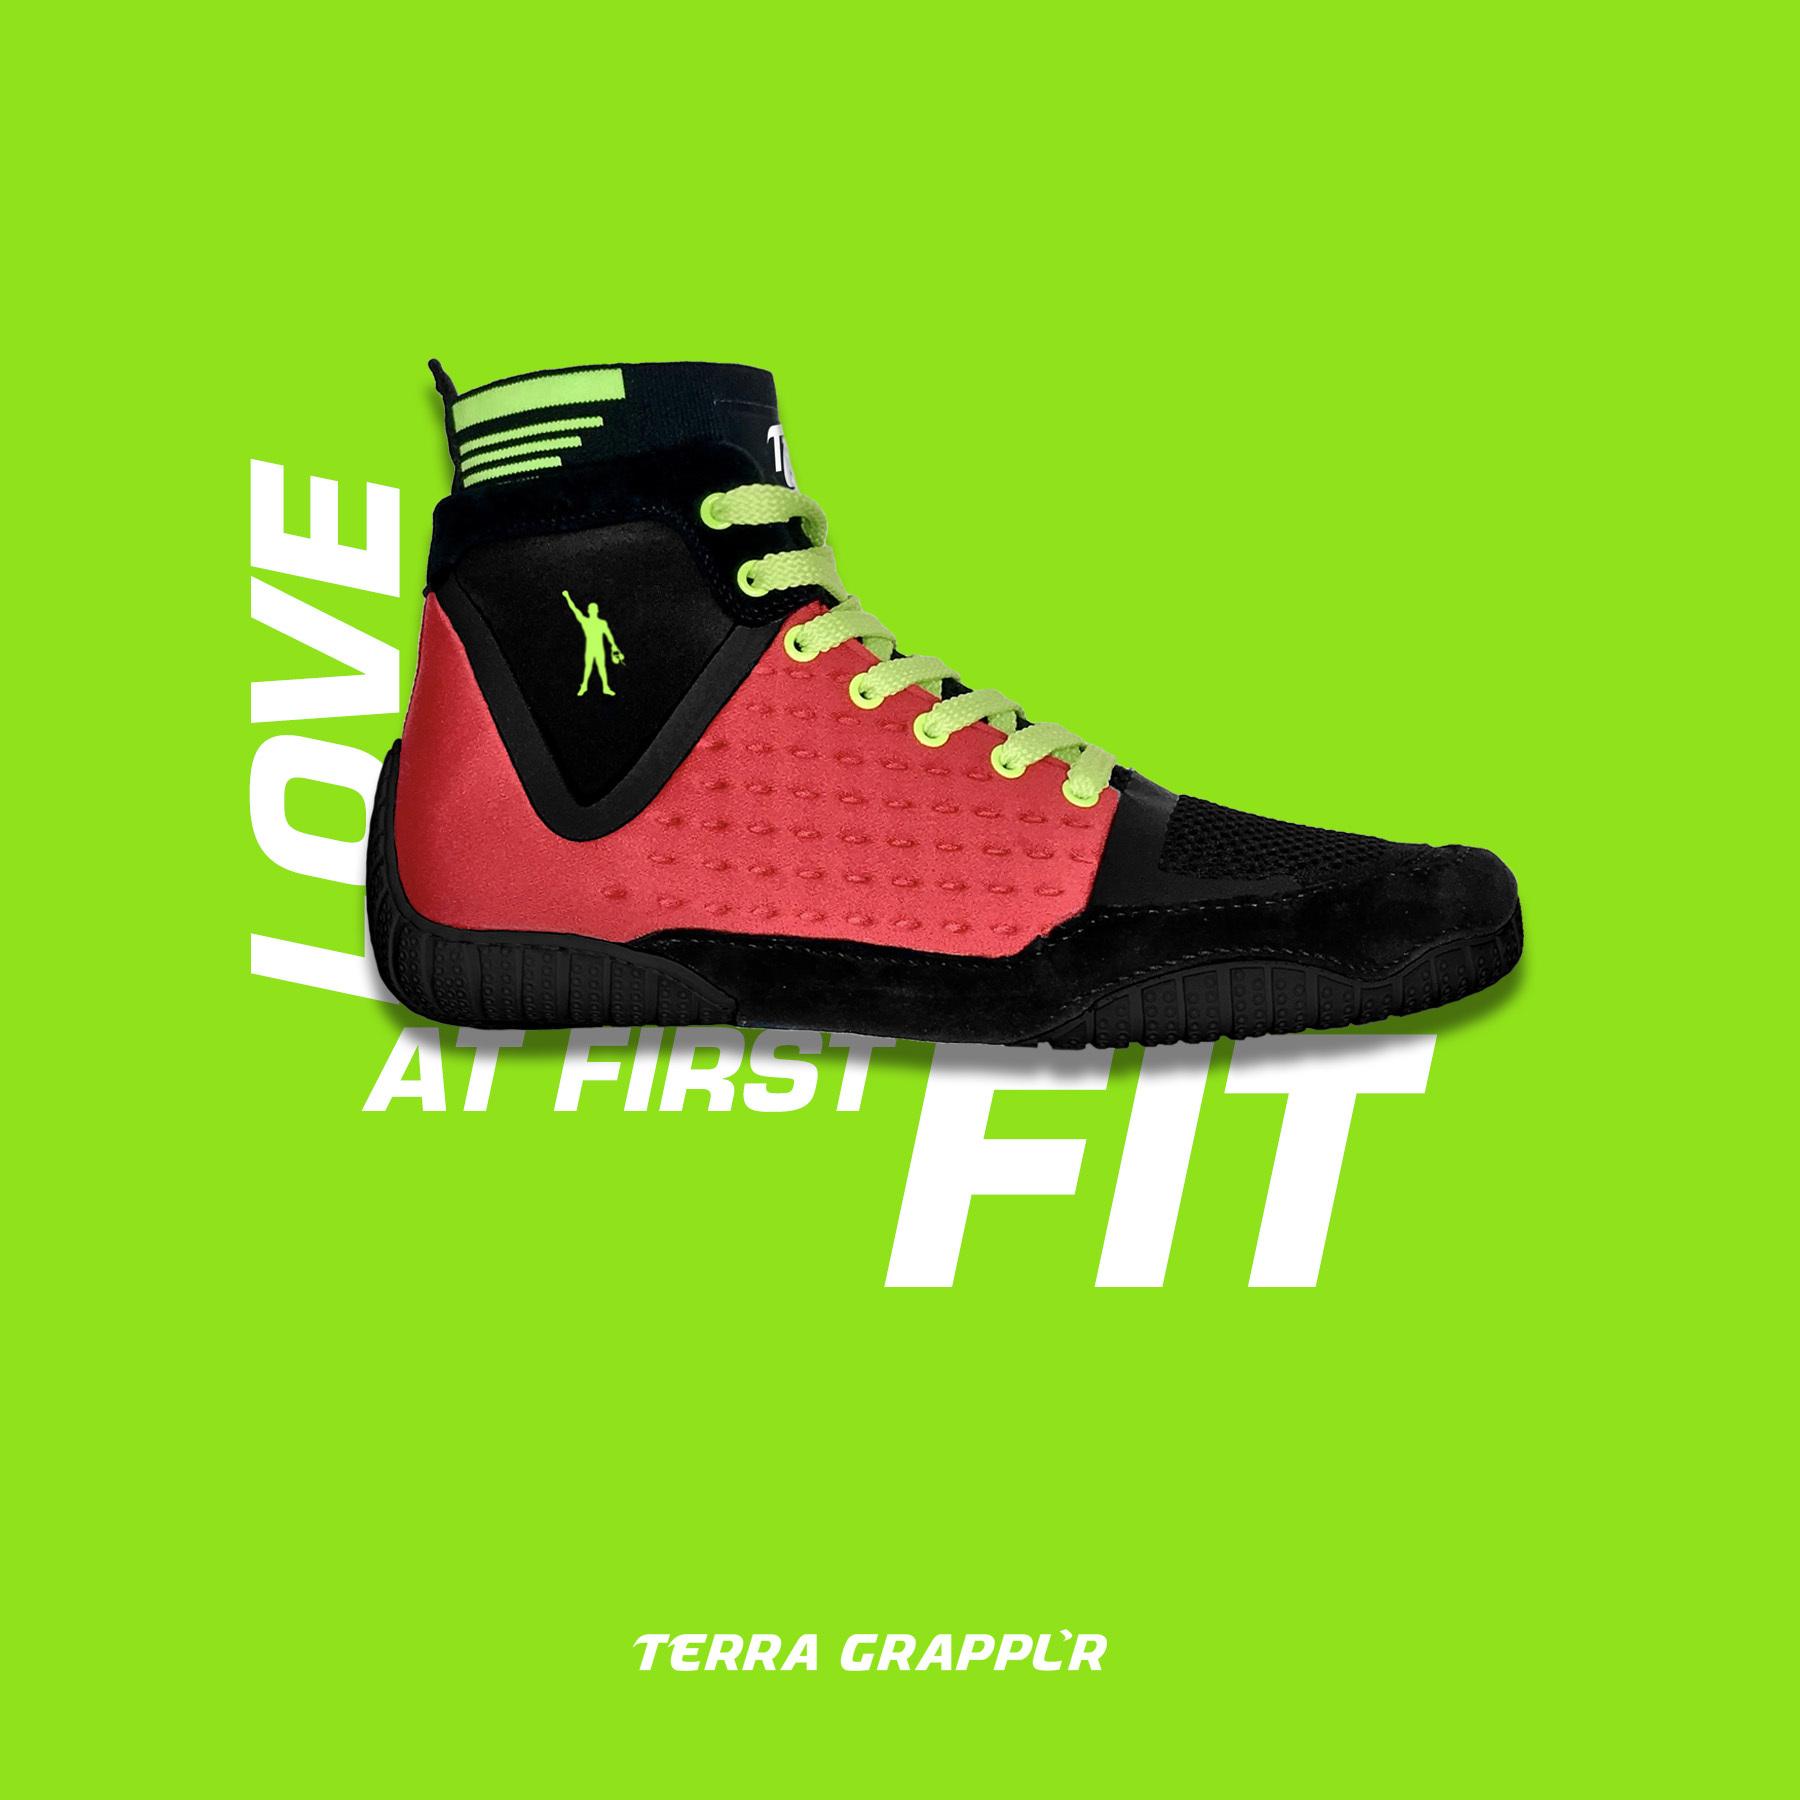 TERRA GRAPPL'R Premier JOK'R Edition Wrestling Shoe